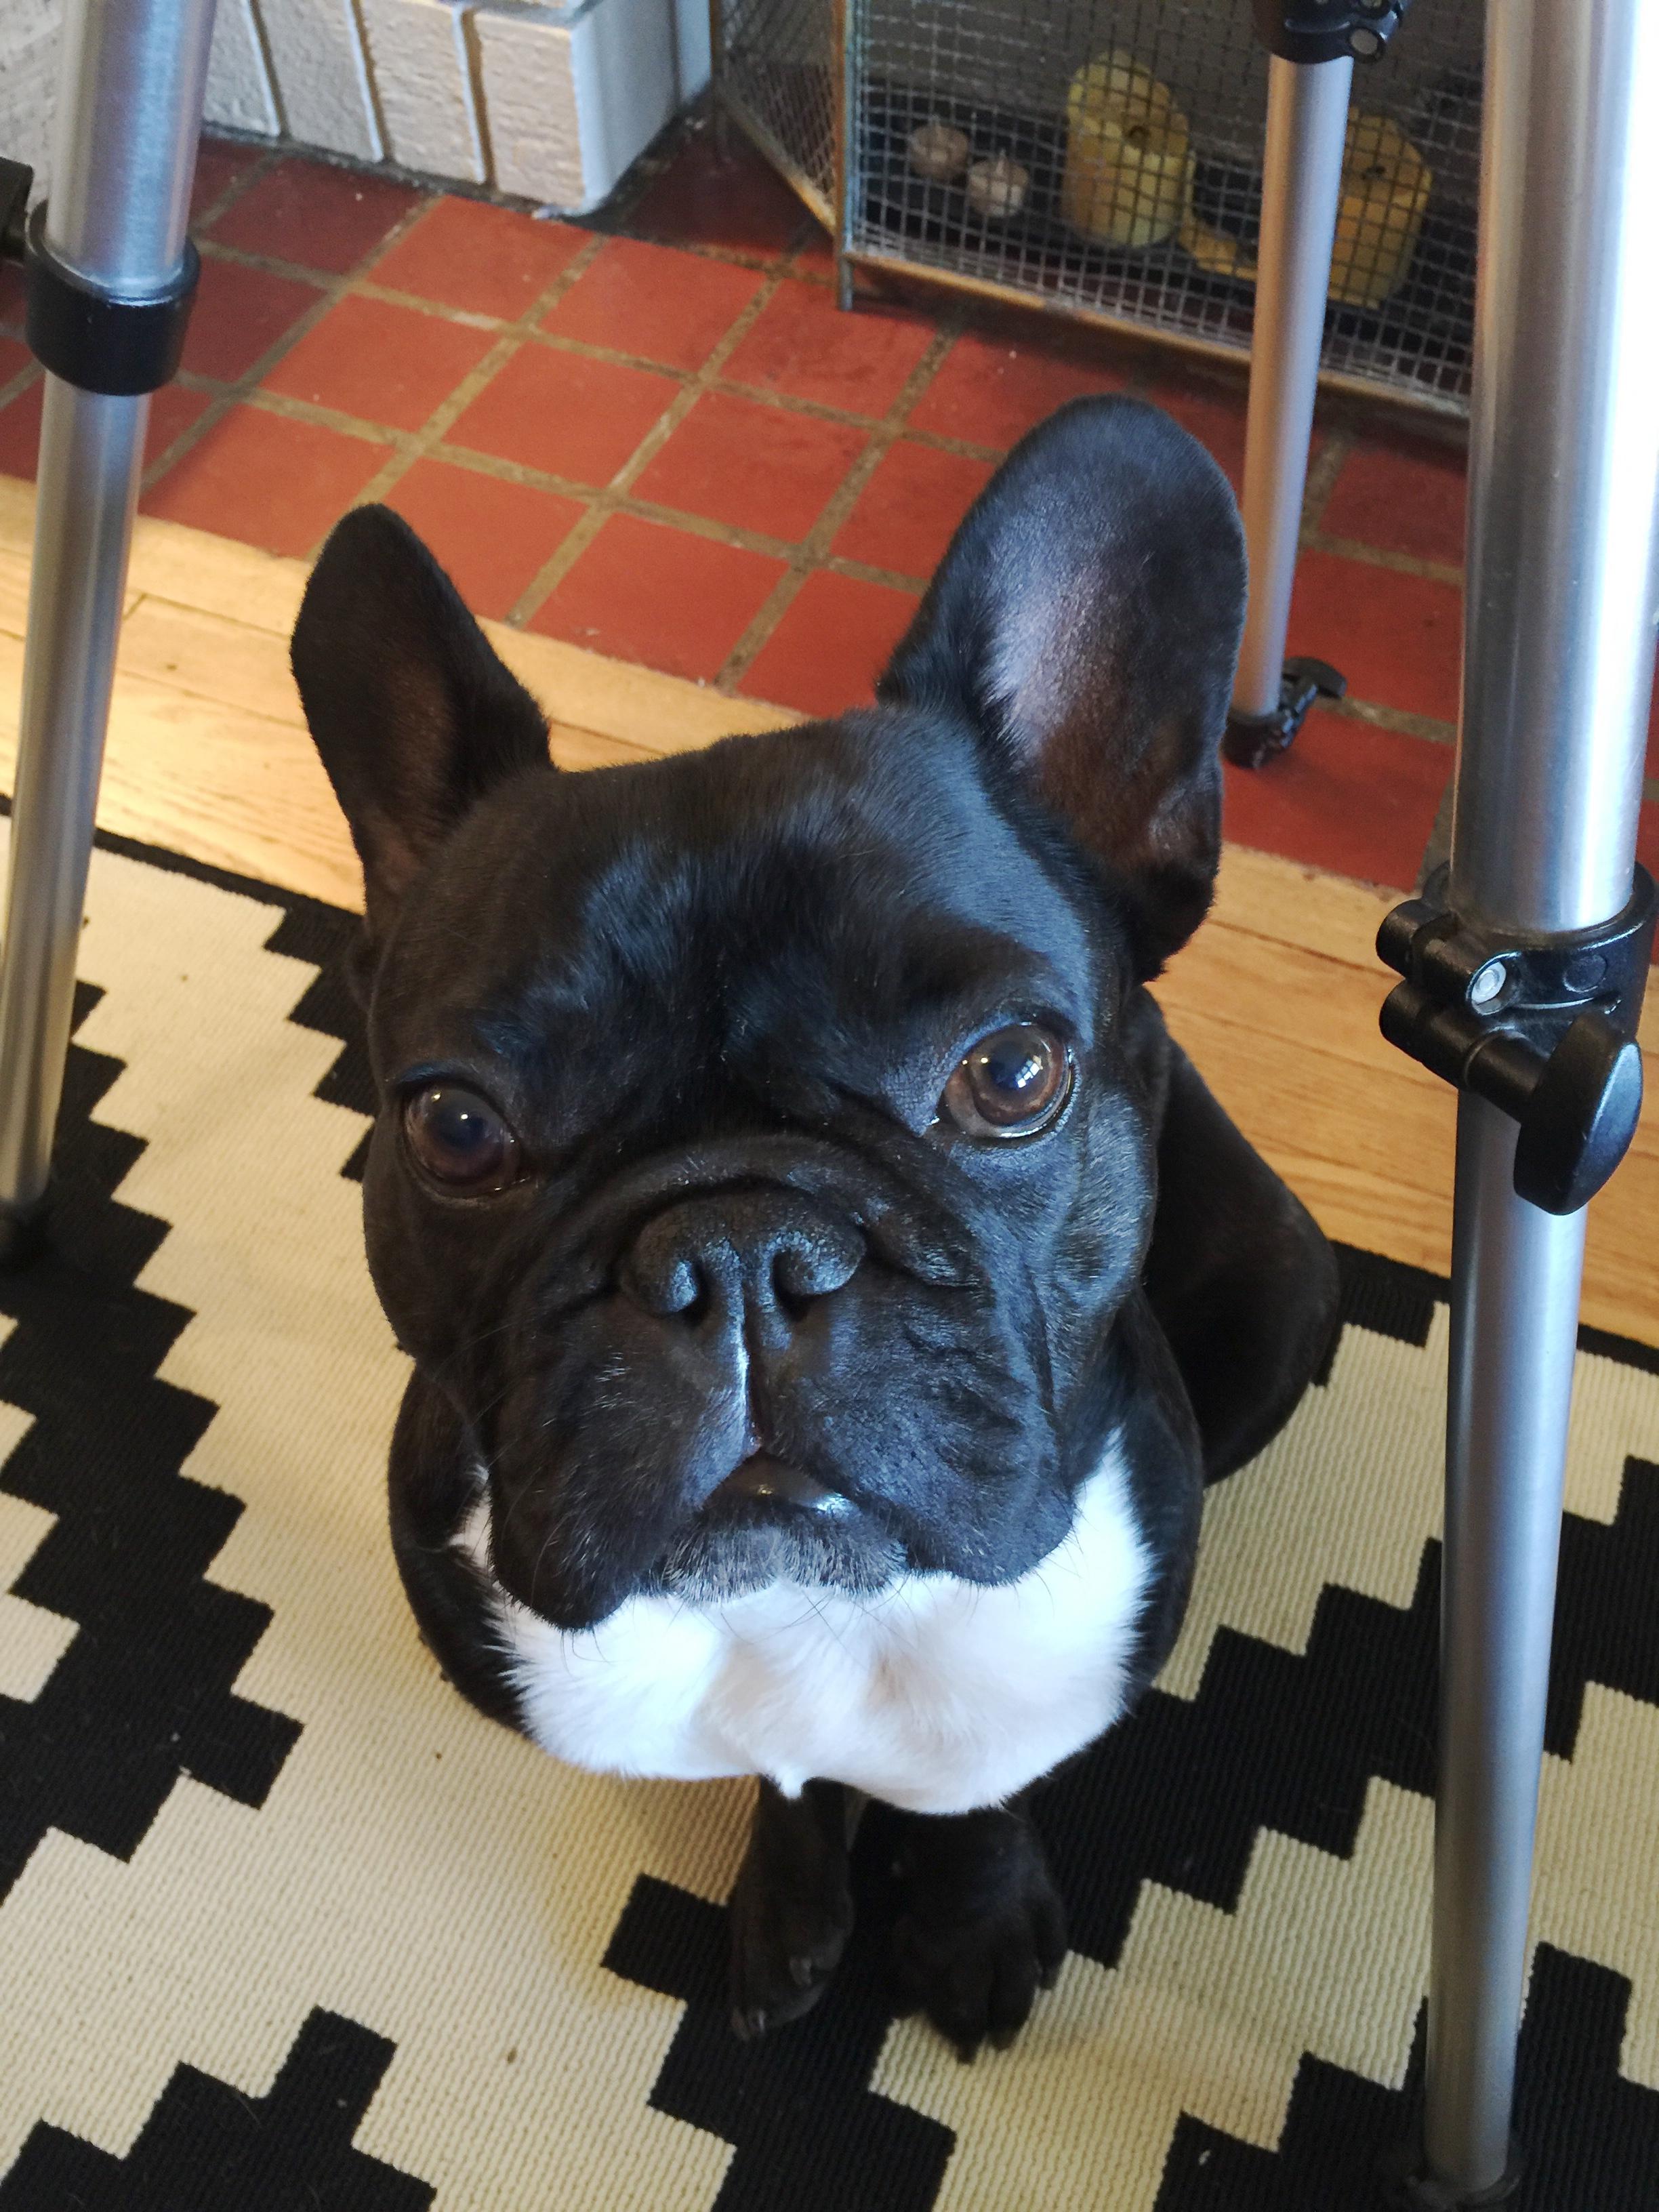 Hi everybuddy!! It's me, your bestest friendlypal, Archie Brindleton!!